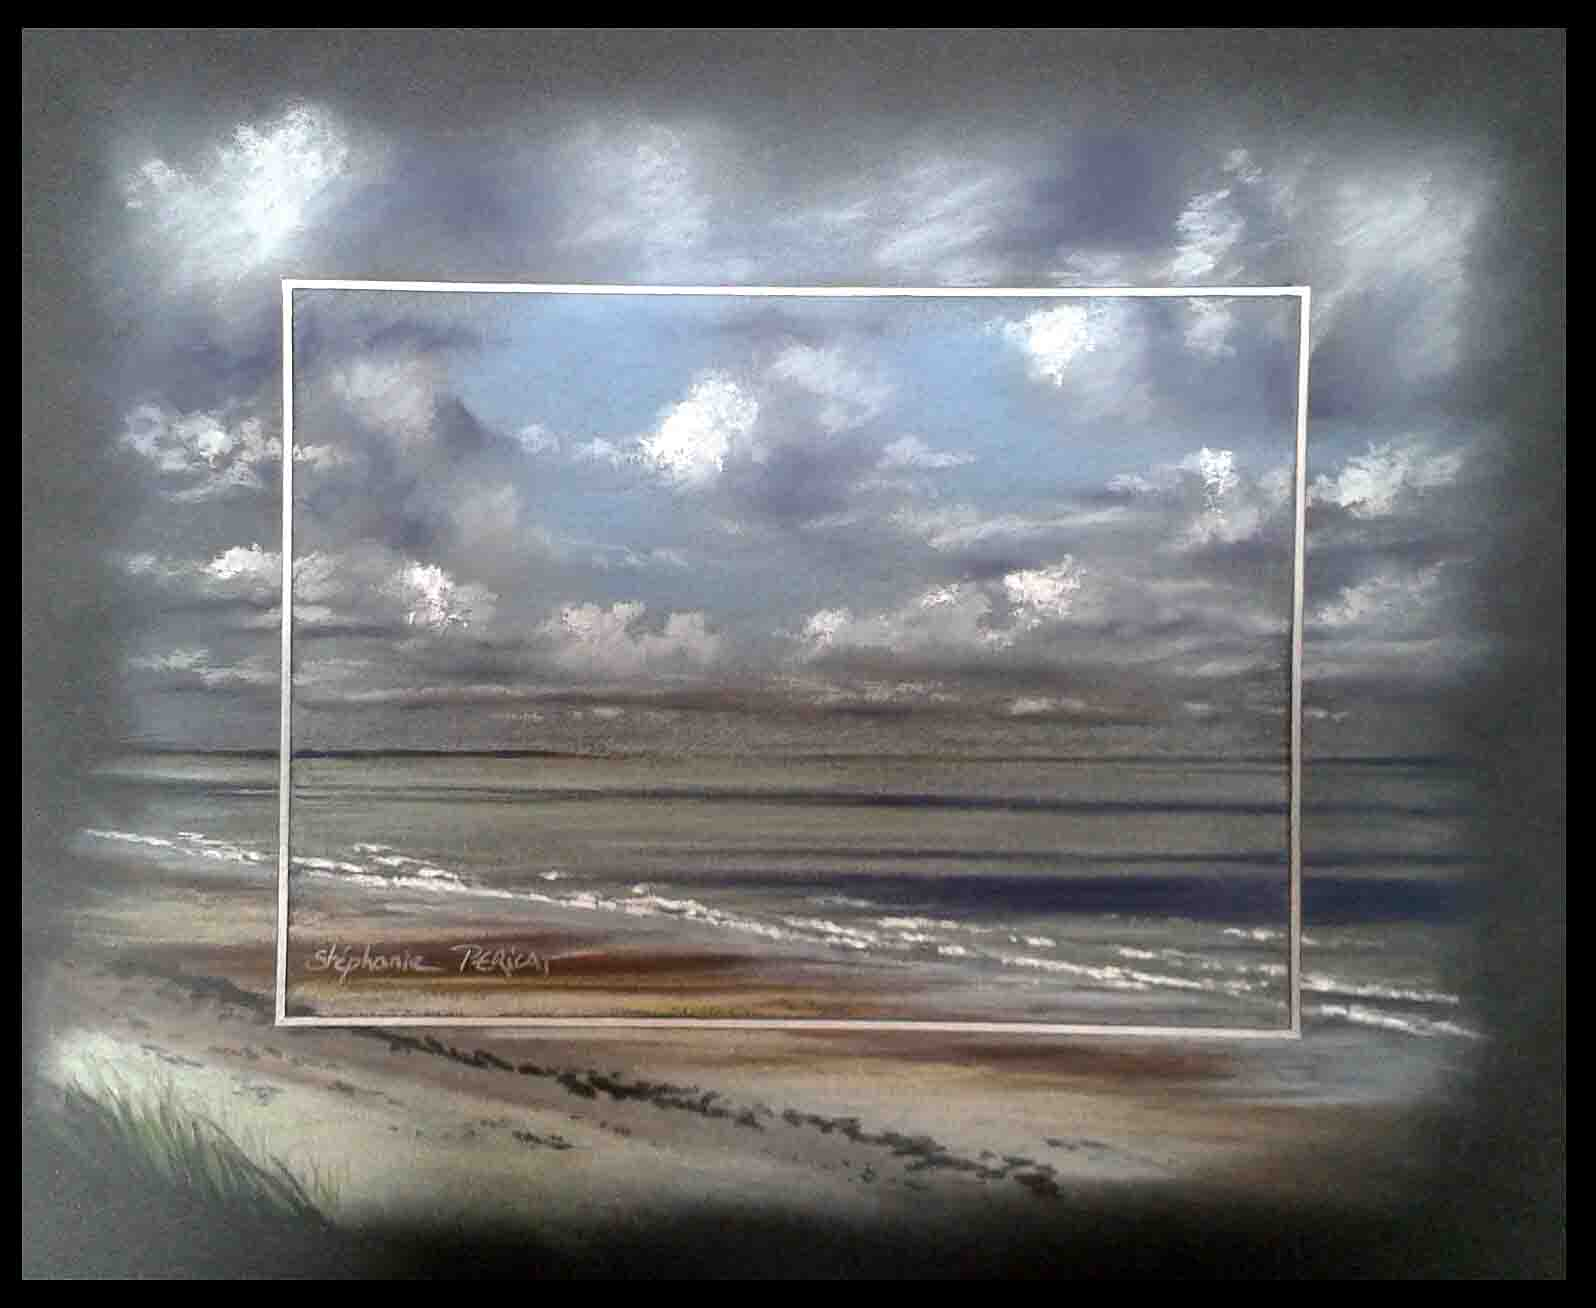 CREANCES PLAGE (creances beach) - pastel sec (soft pastel) - 24x30cm